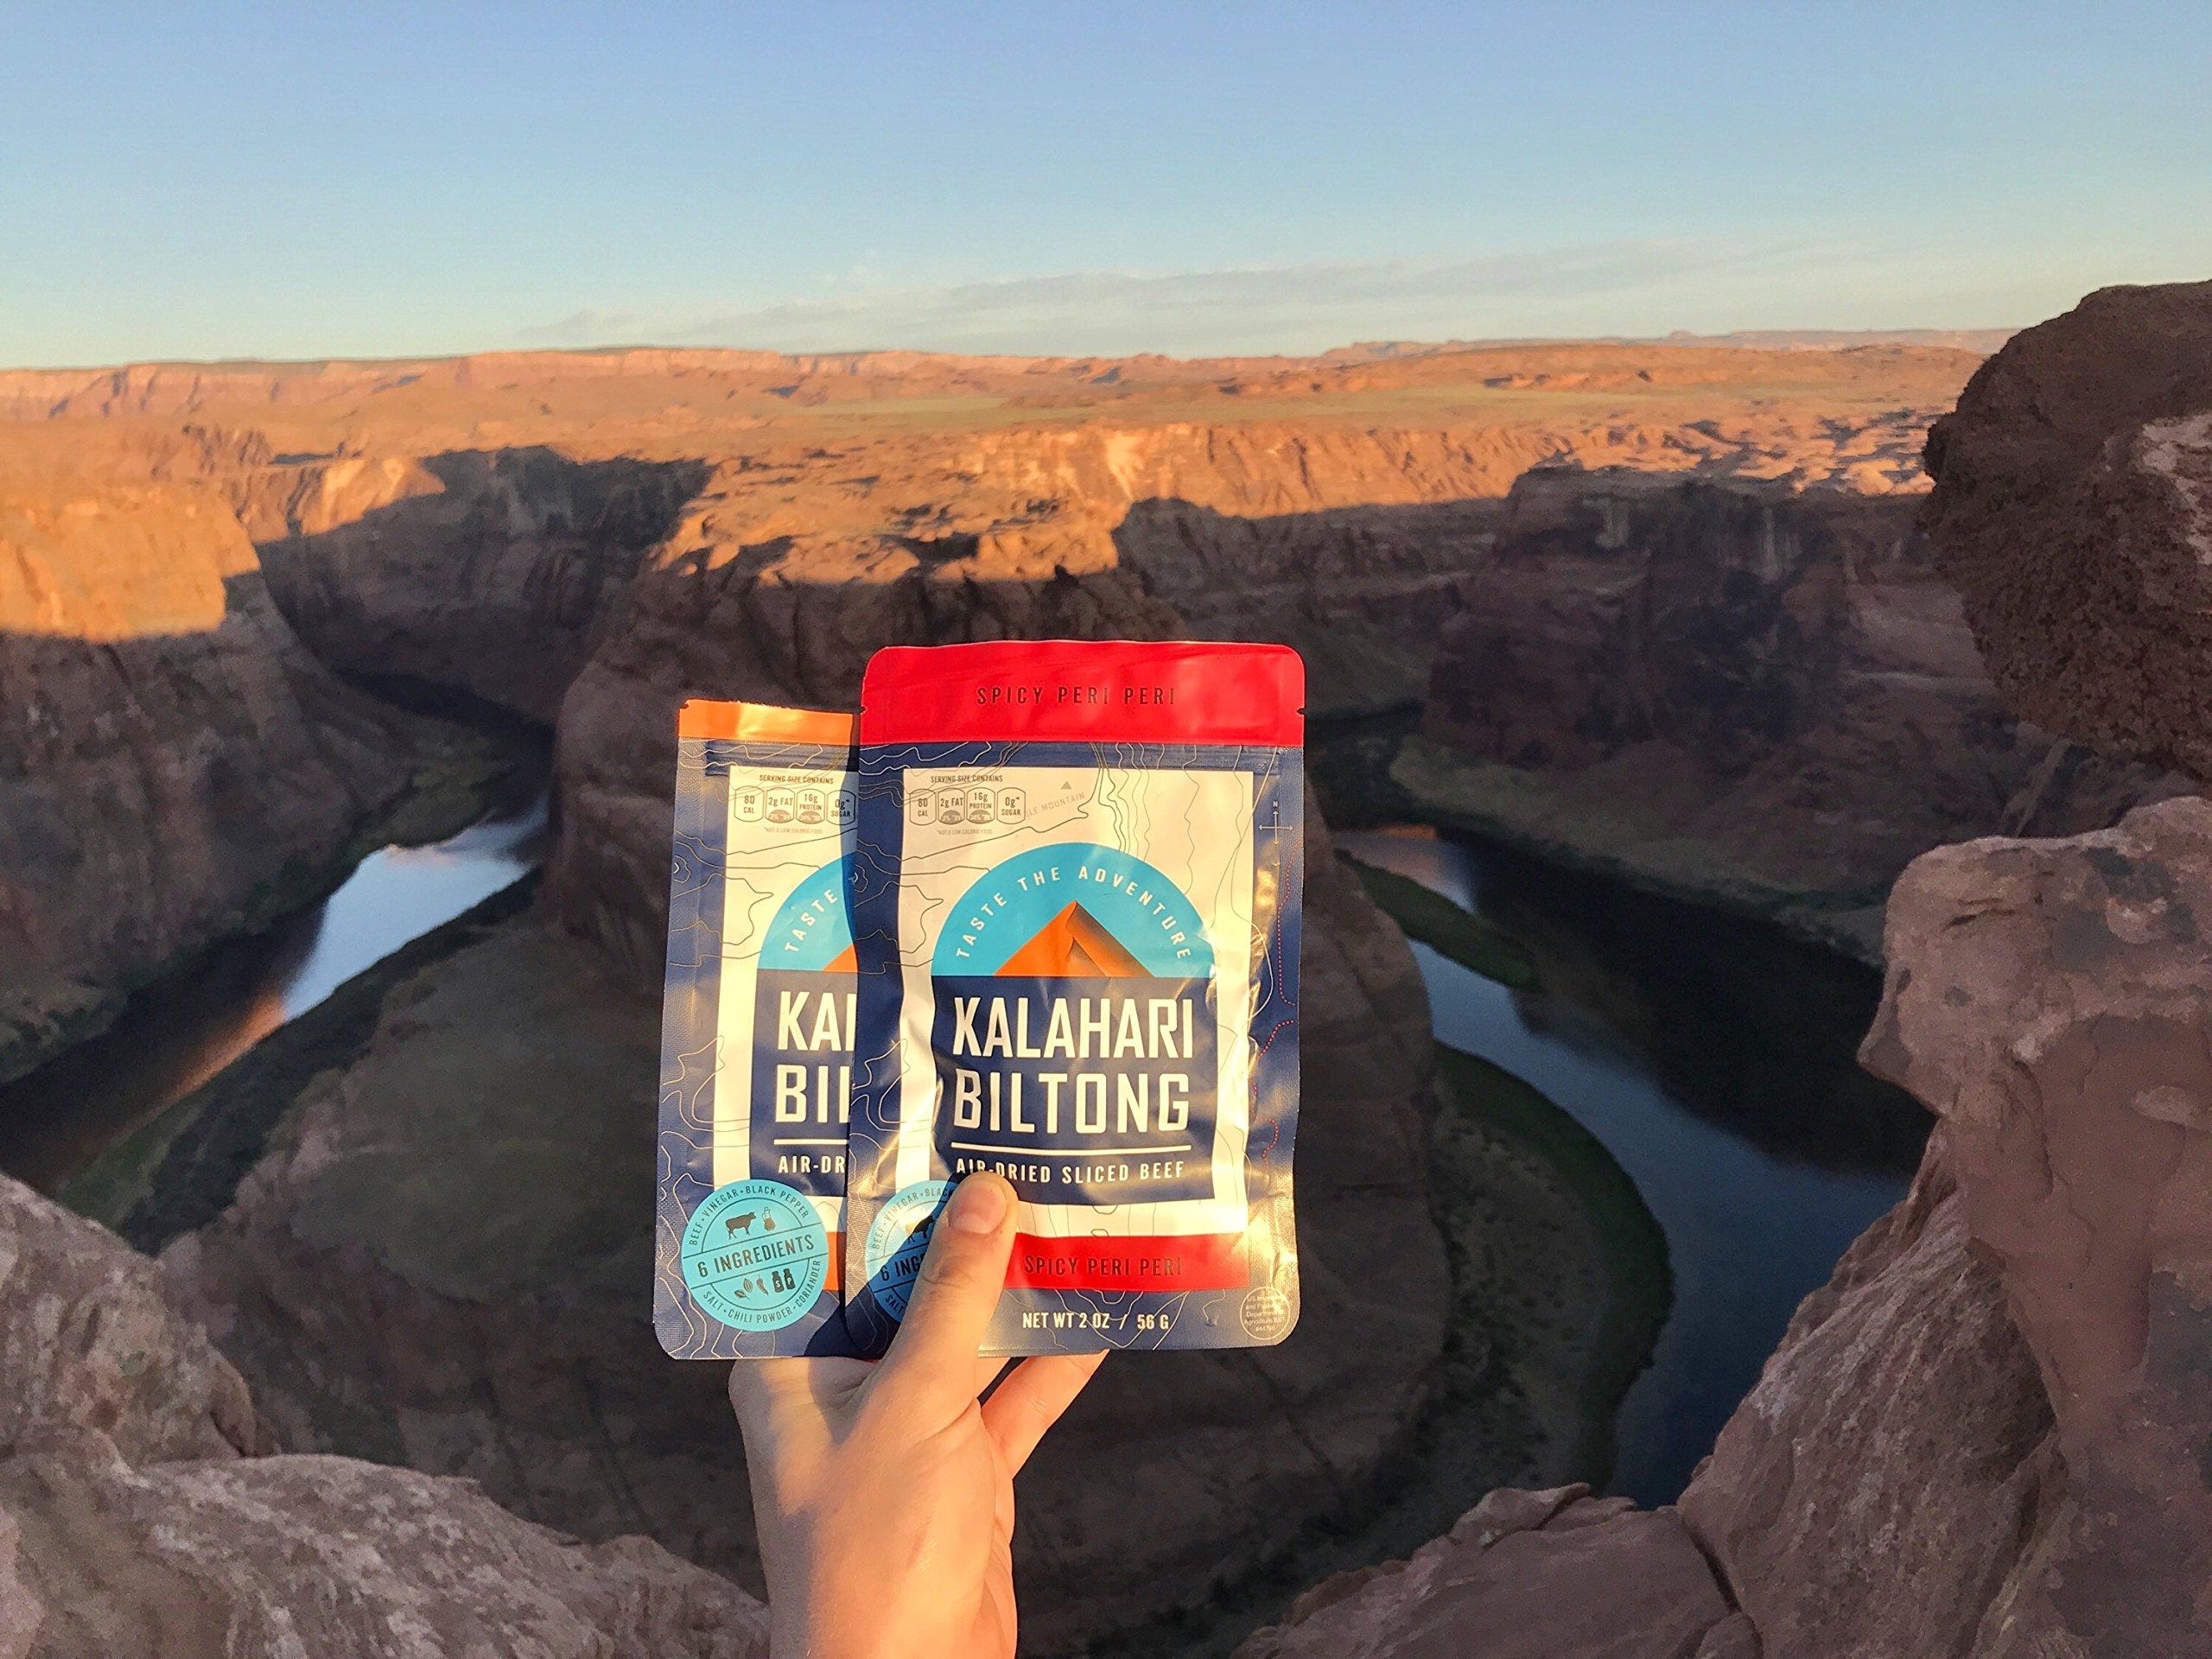 Kalahari Biltong | Air-Dried Thinly Sliced Beef | Spicy Peri Peri | 2oz (Pack of 8) | Zero Sugar | Keto & Paleo | Gluten Free | Better than Jerky by Kalahari Biltong (Image #4)